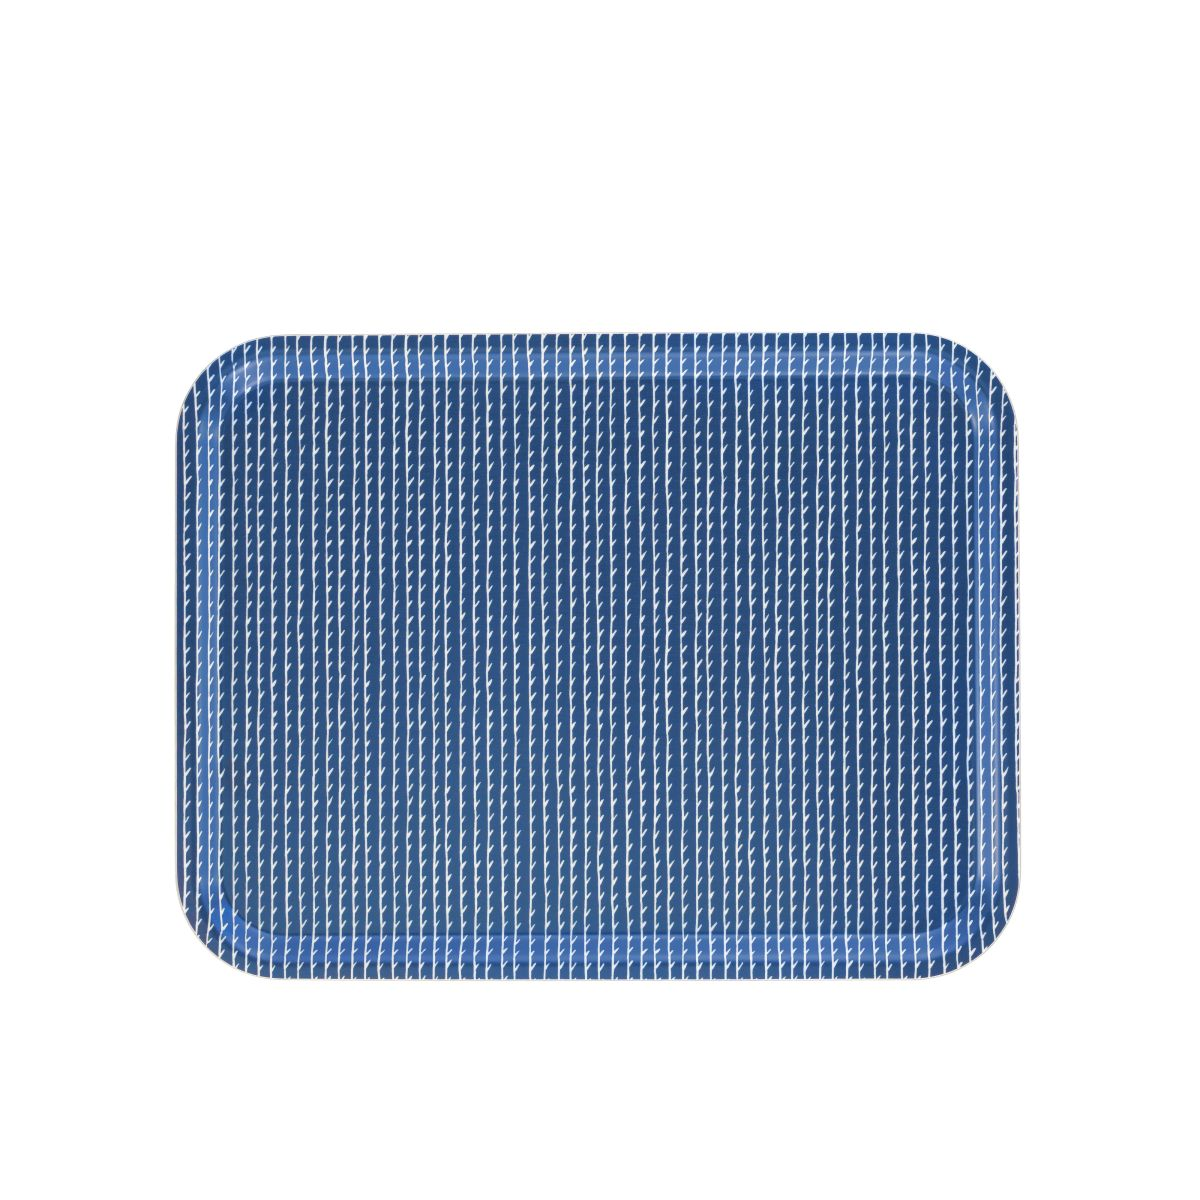 Rivi-Tray-blue_white-large_F_web-3869482